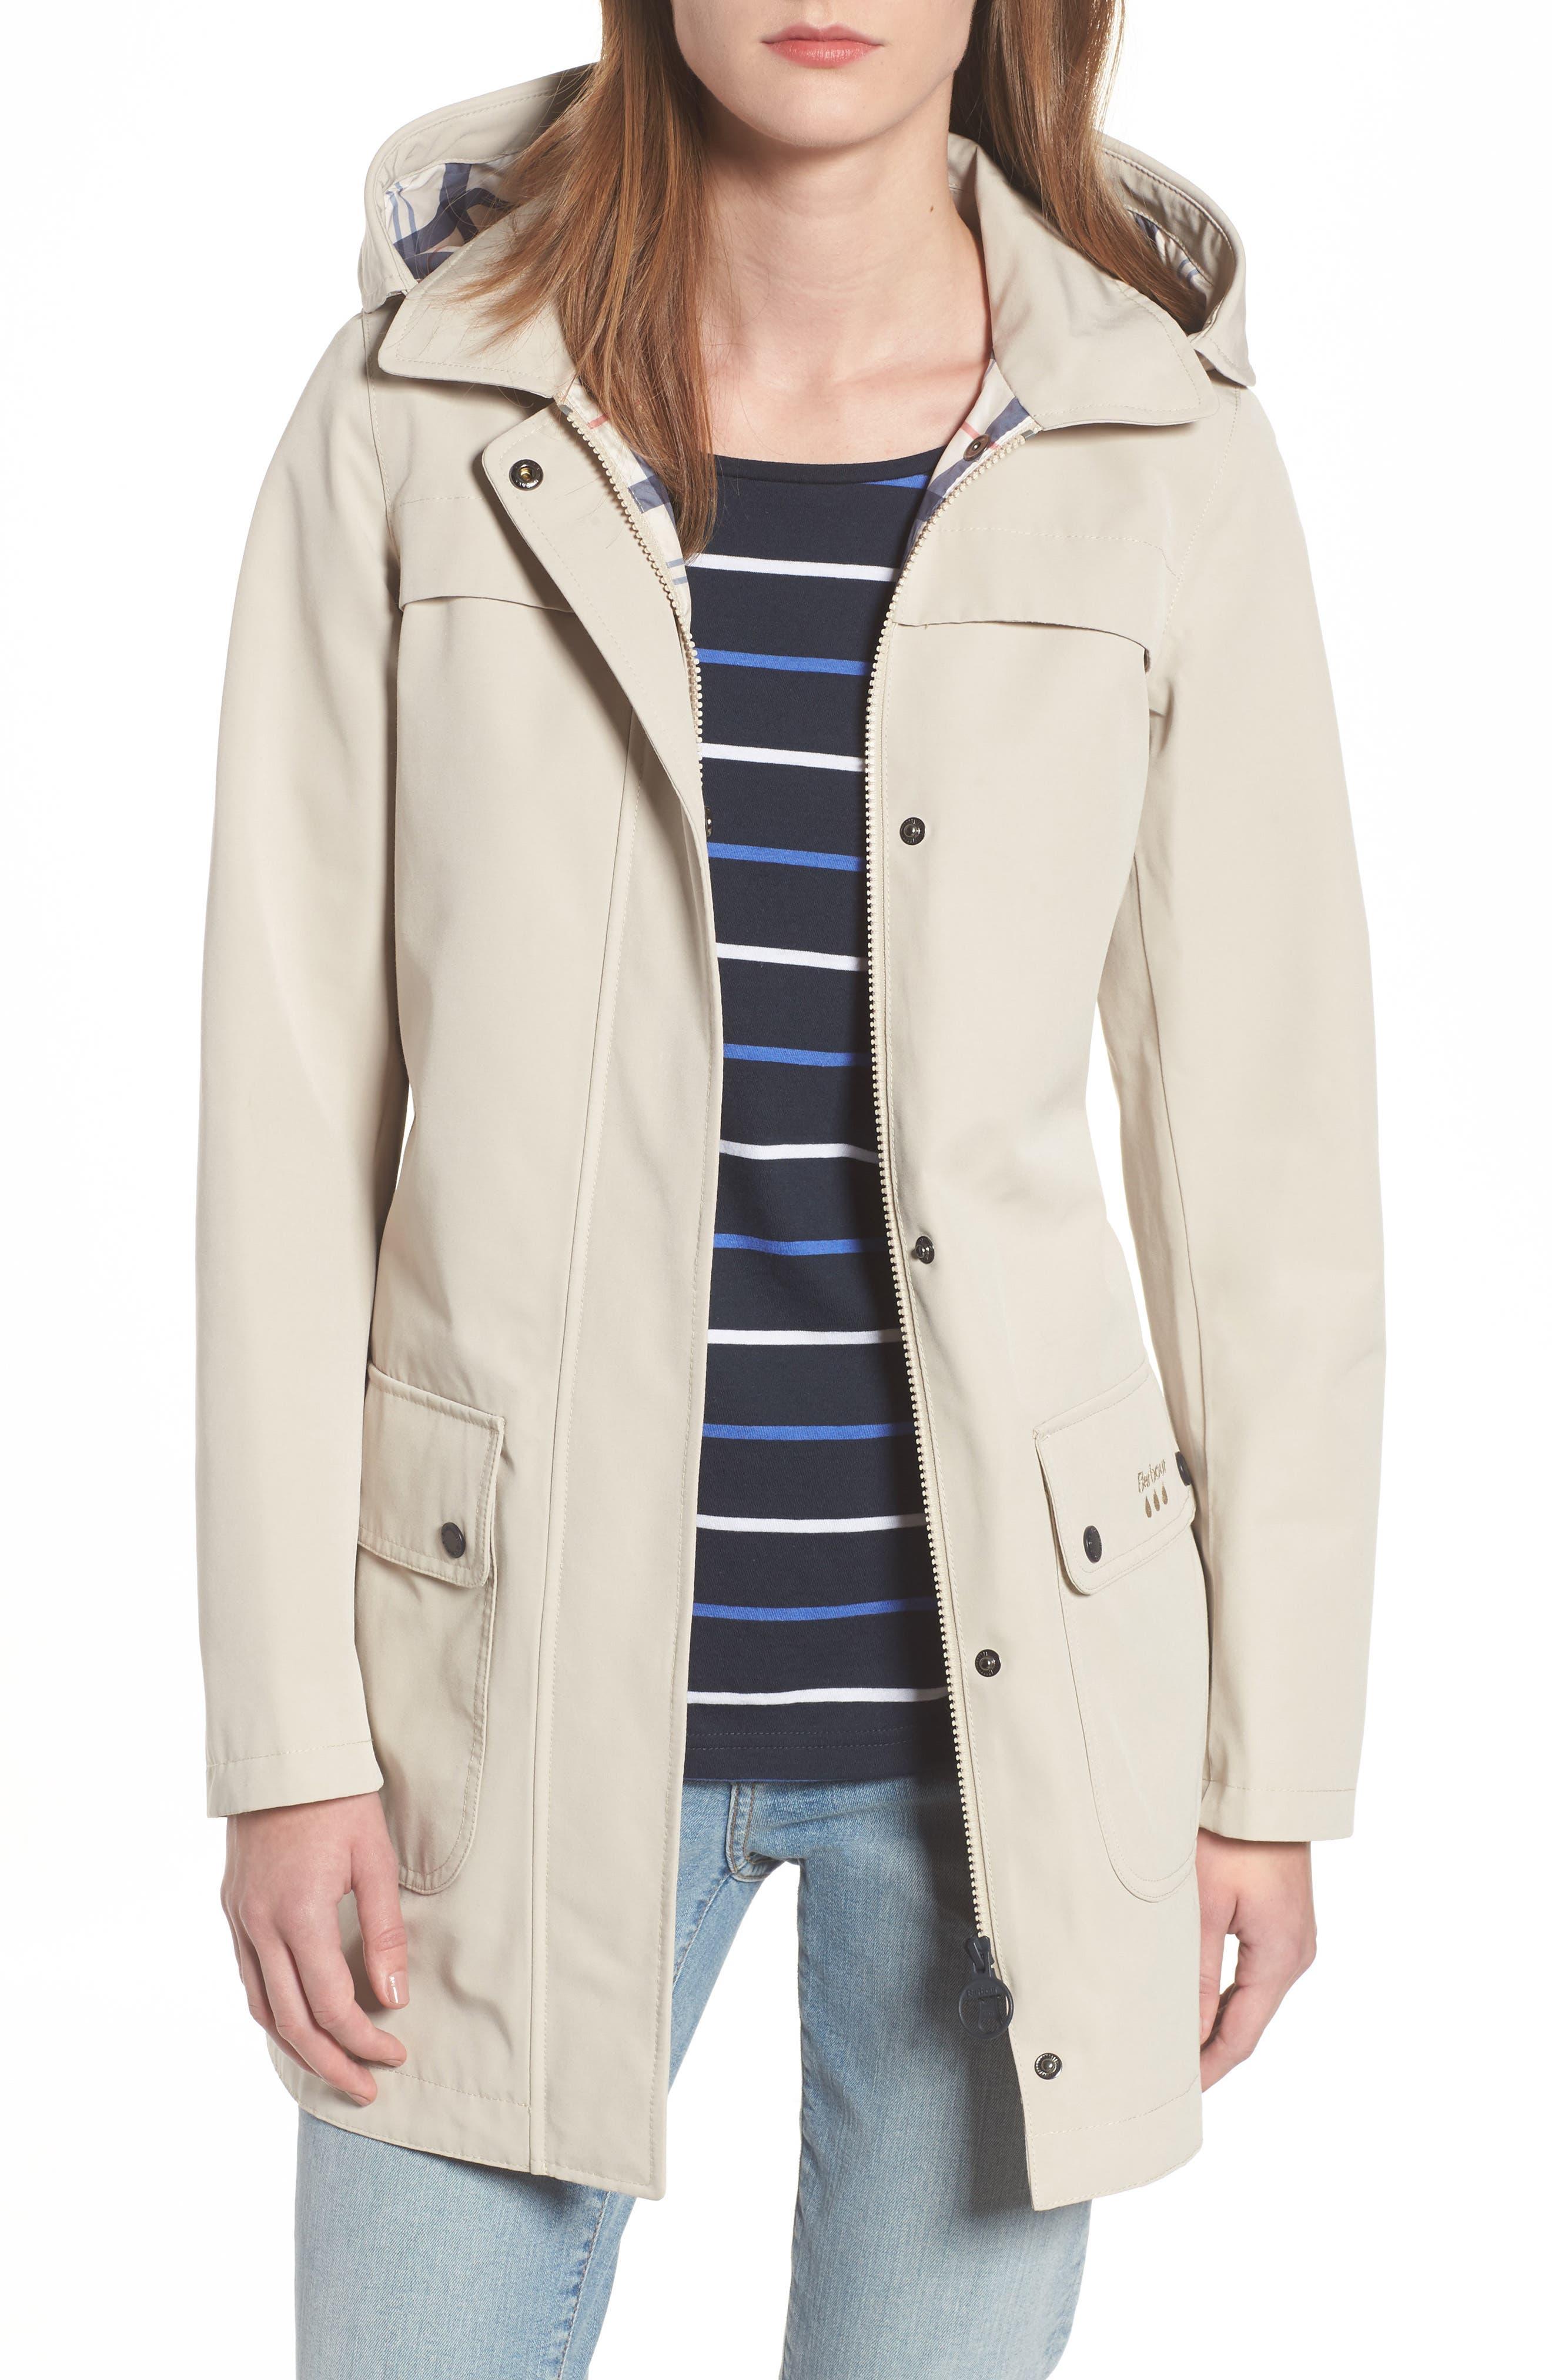 Almanac Hooded Jacket,                         Main,                         color, 270